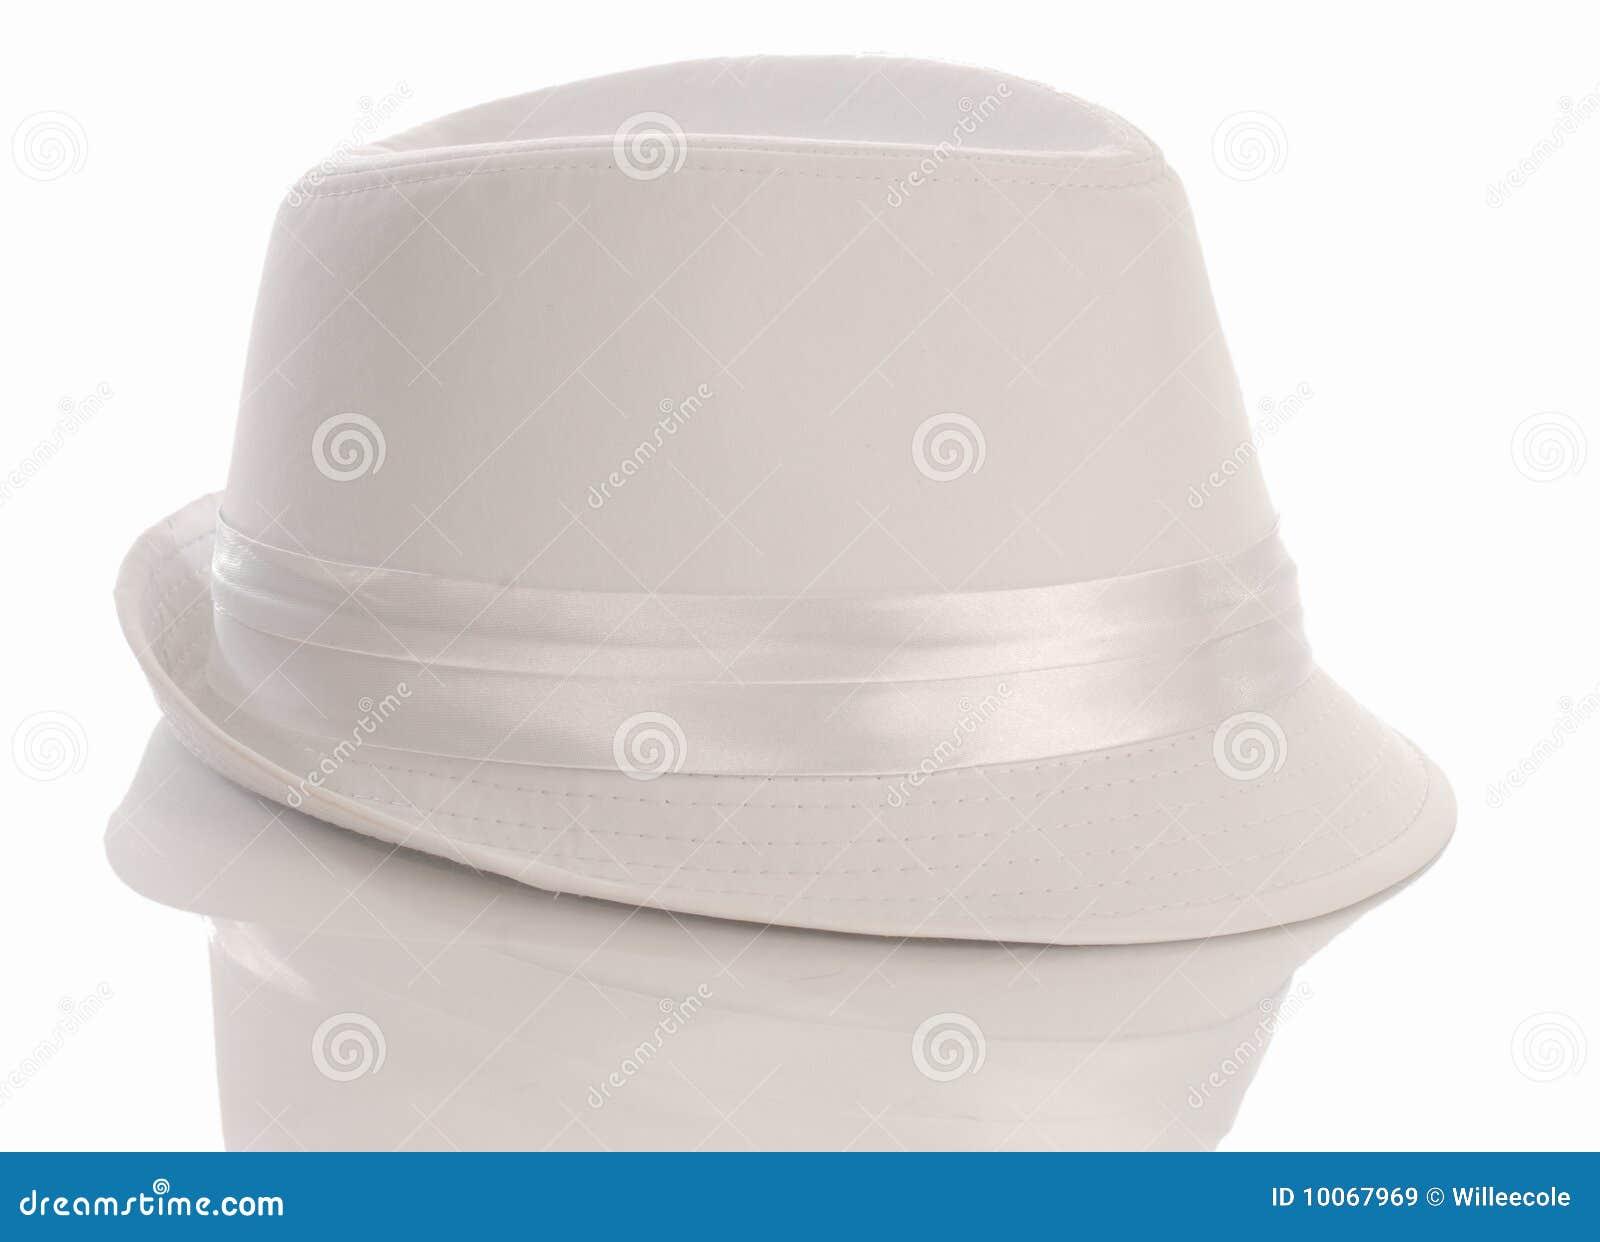 fd21b28bccf Men s white dress hat stock image. Image of fedora